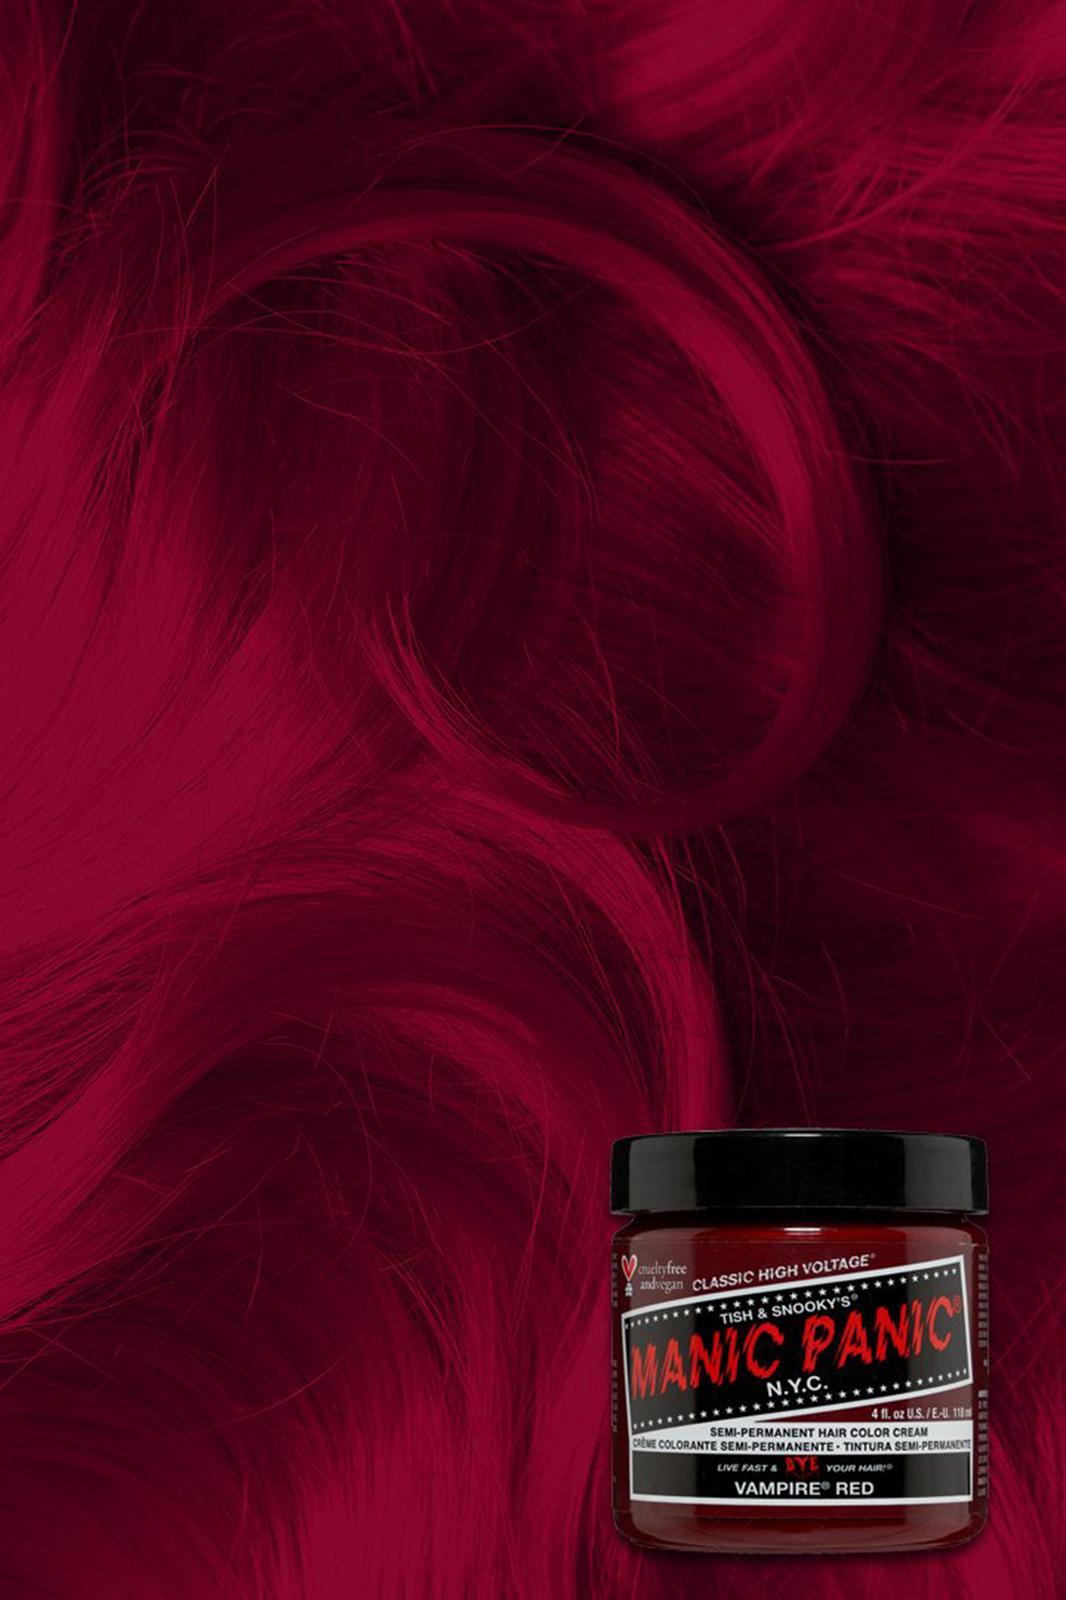 Classic Vampire Red